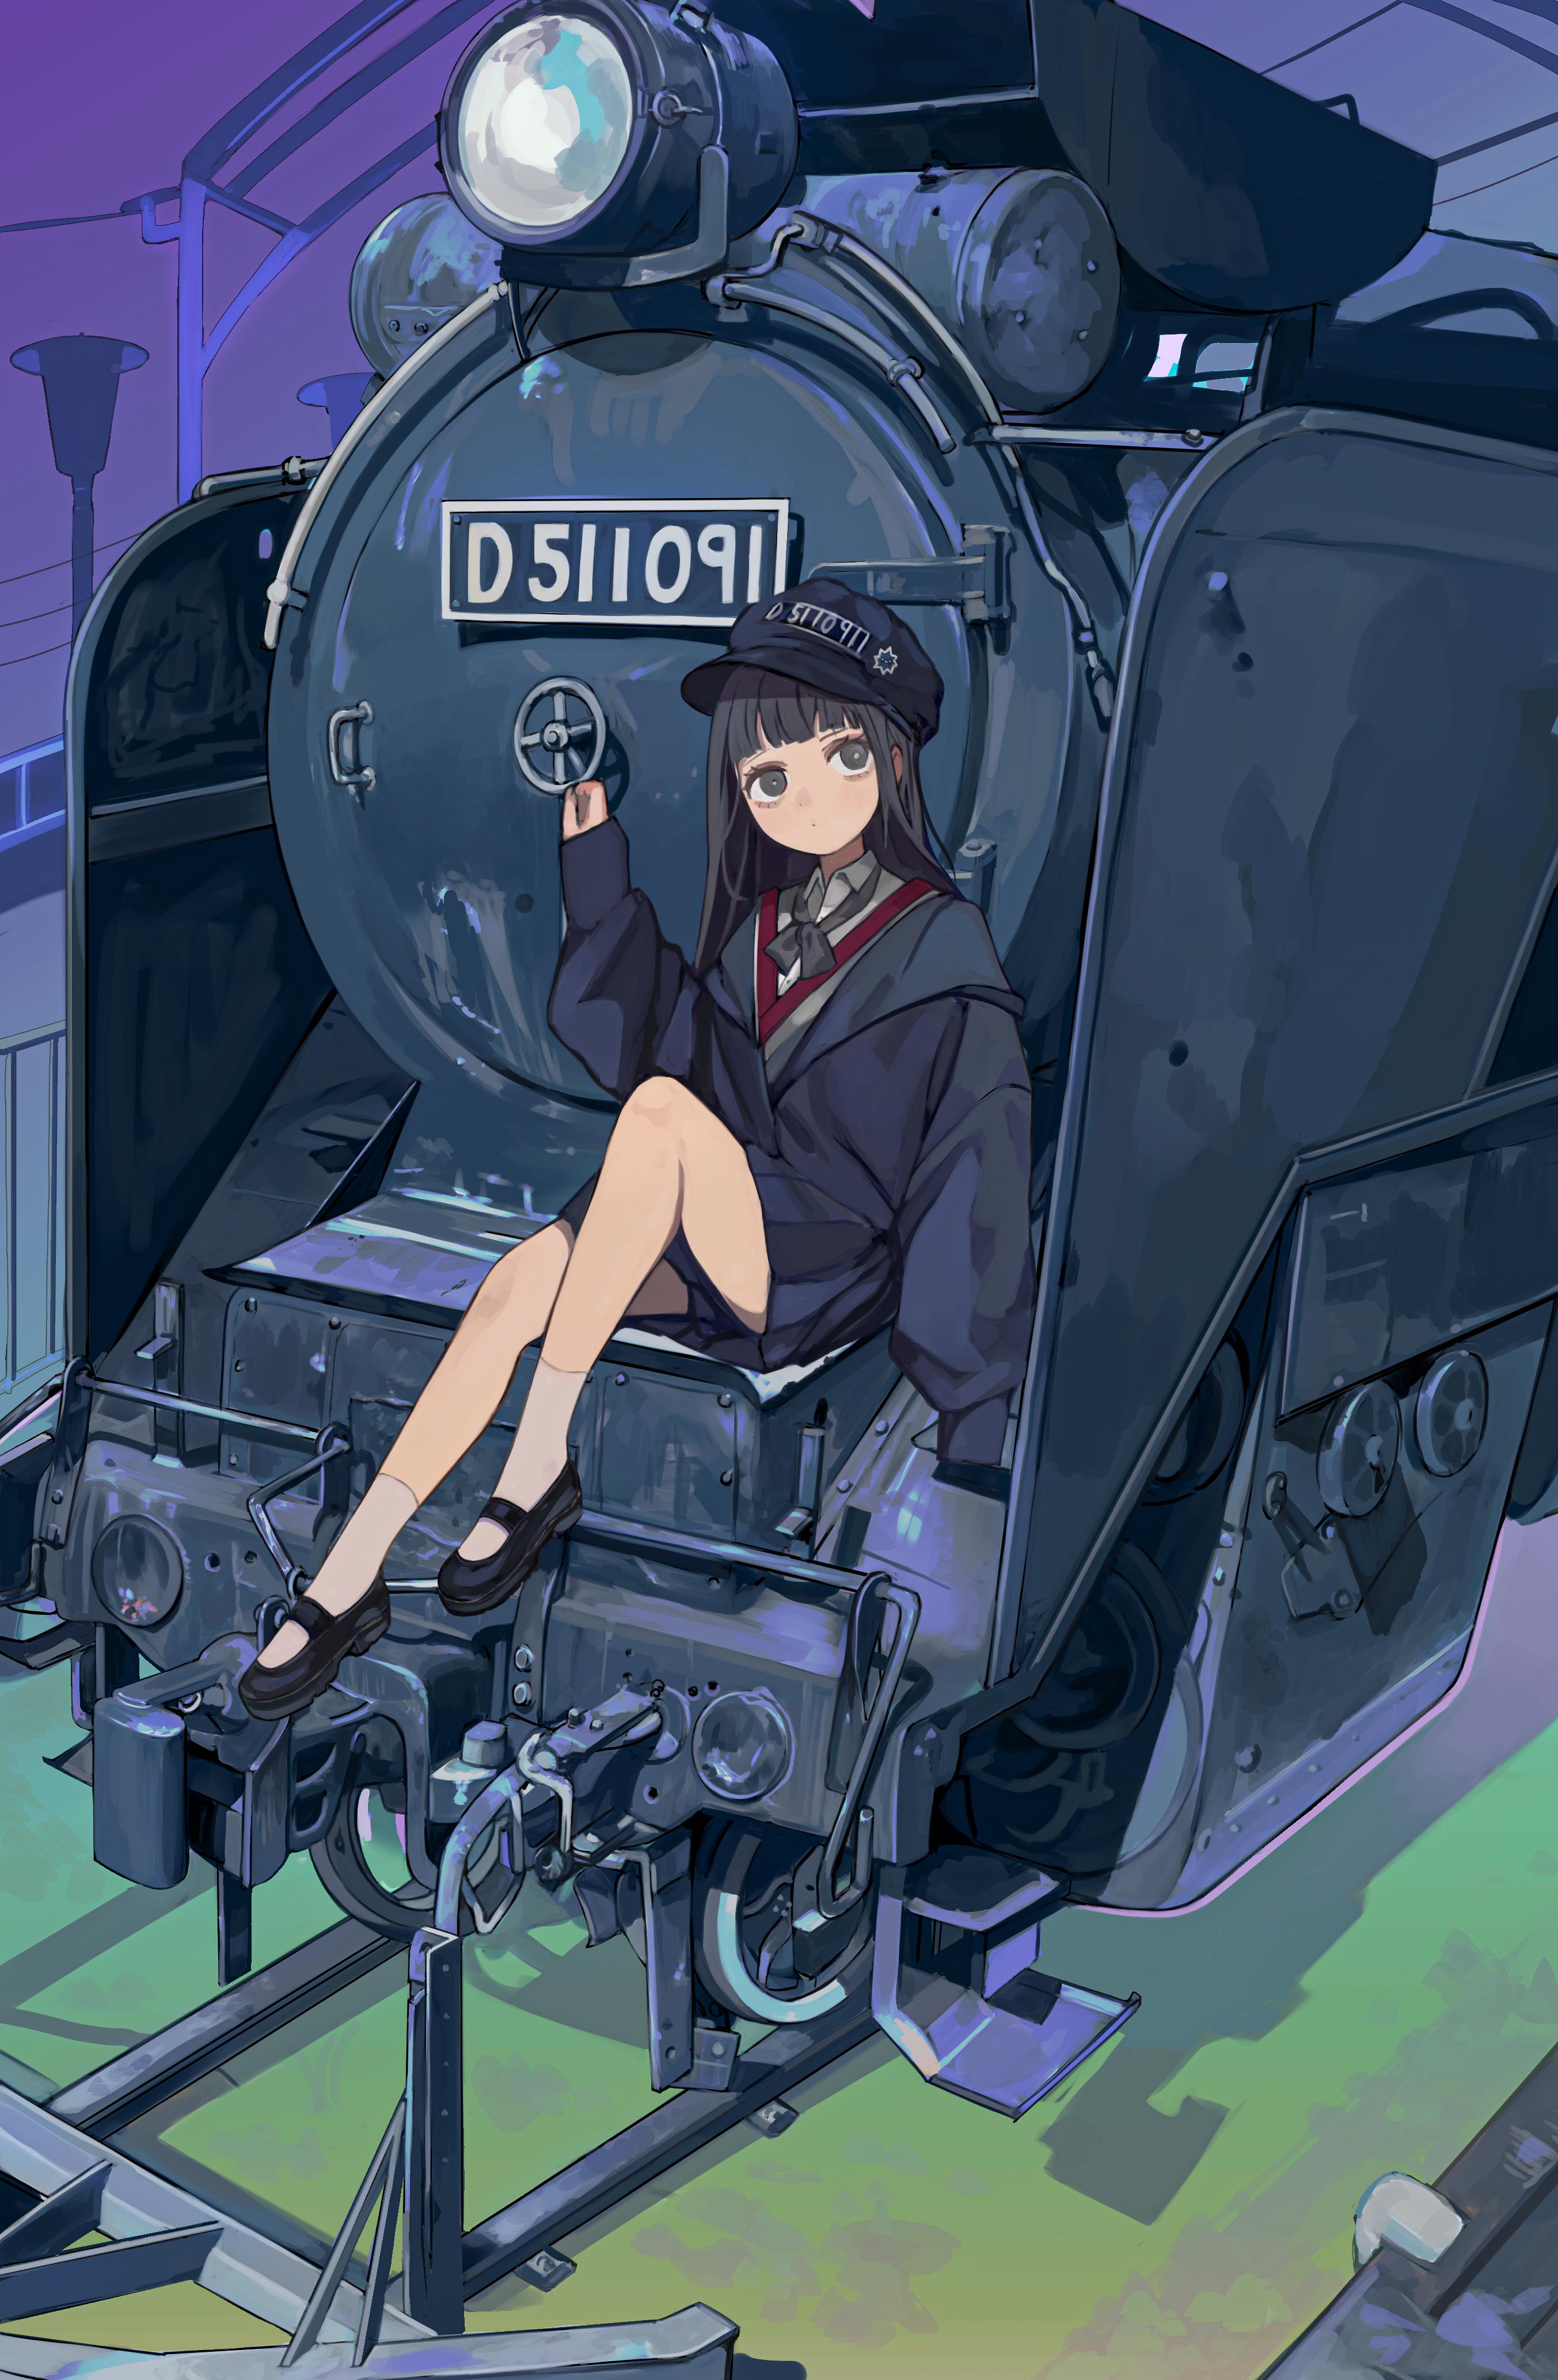 Anime 2706x4134 bangs black eyes black hair blunt bangs long sleeves ribbon train locomotive Tokiwata Soul